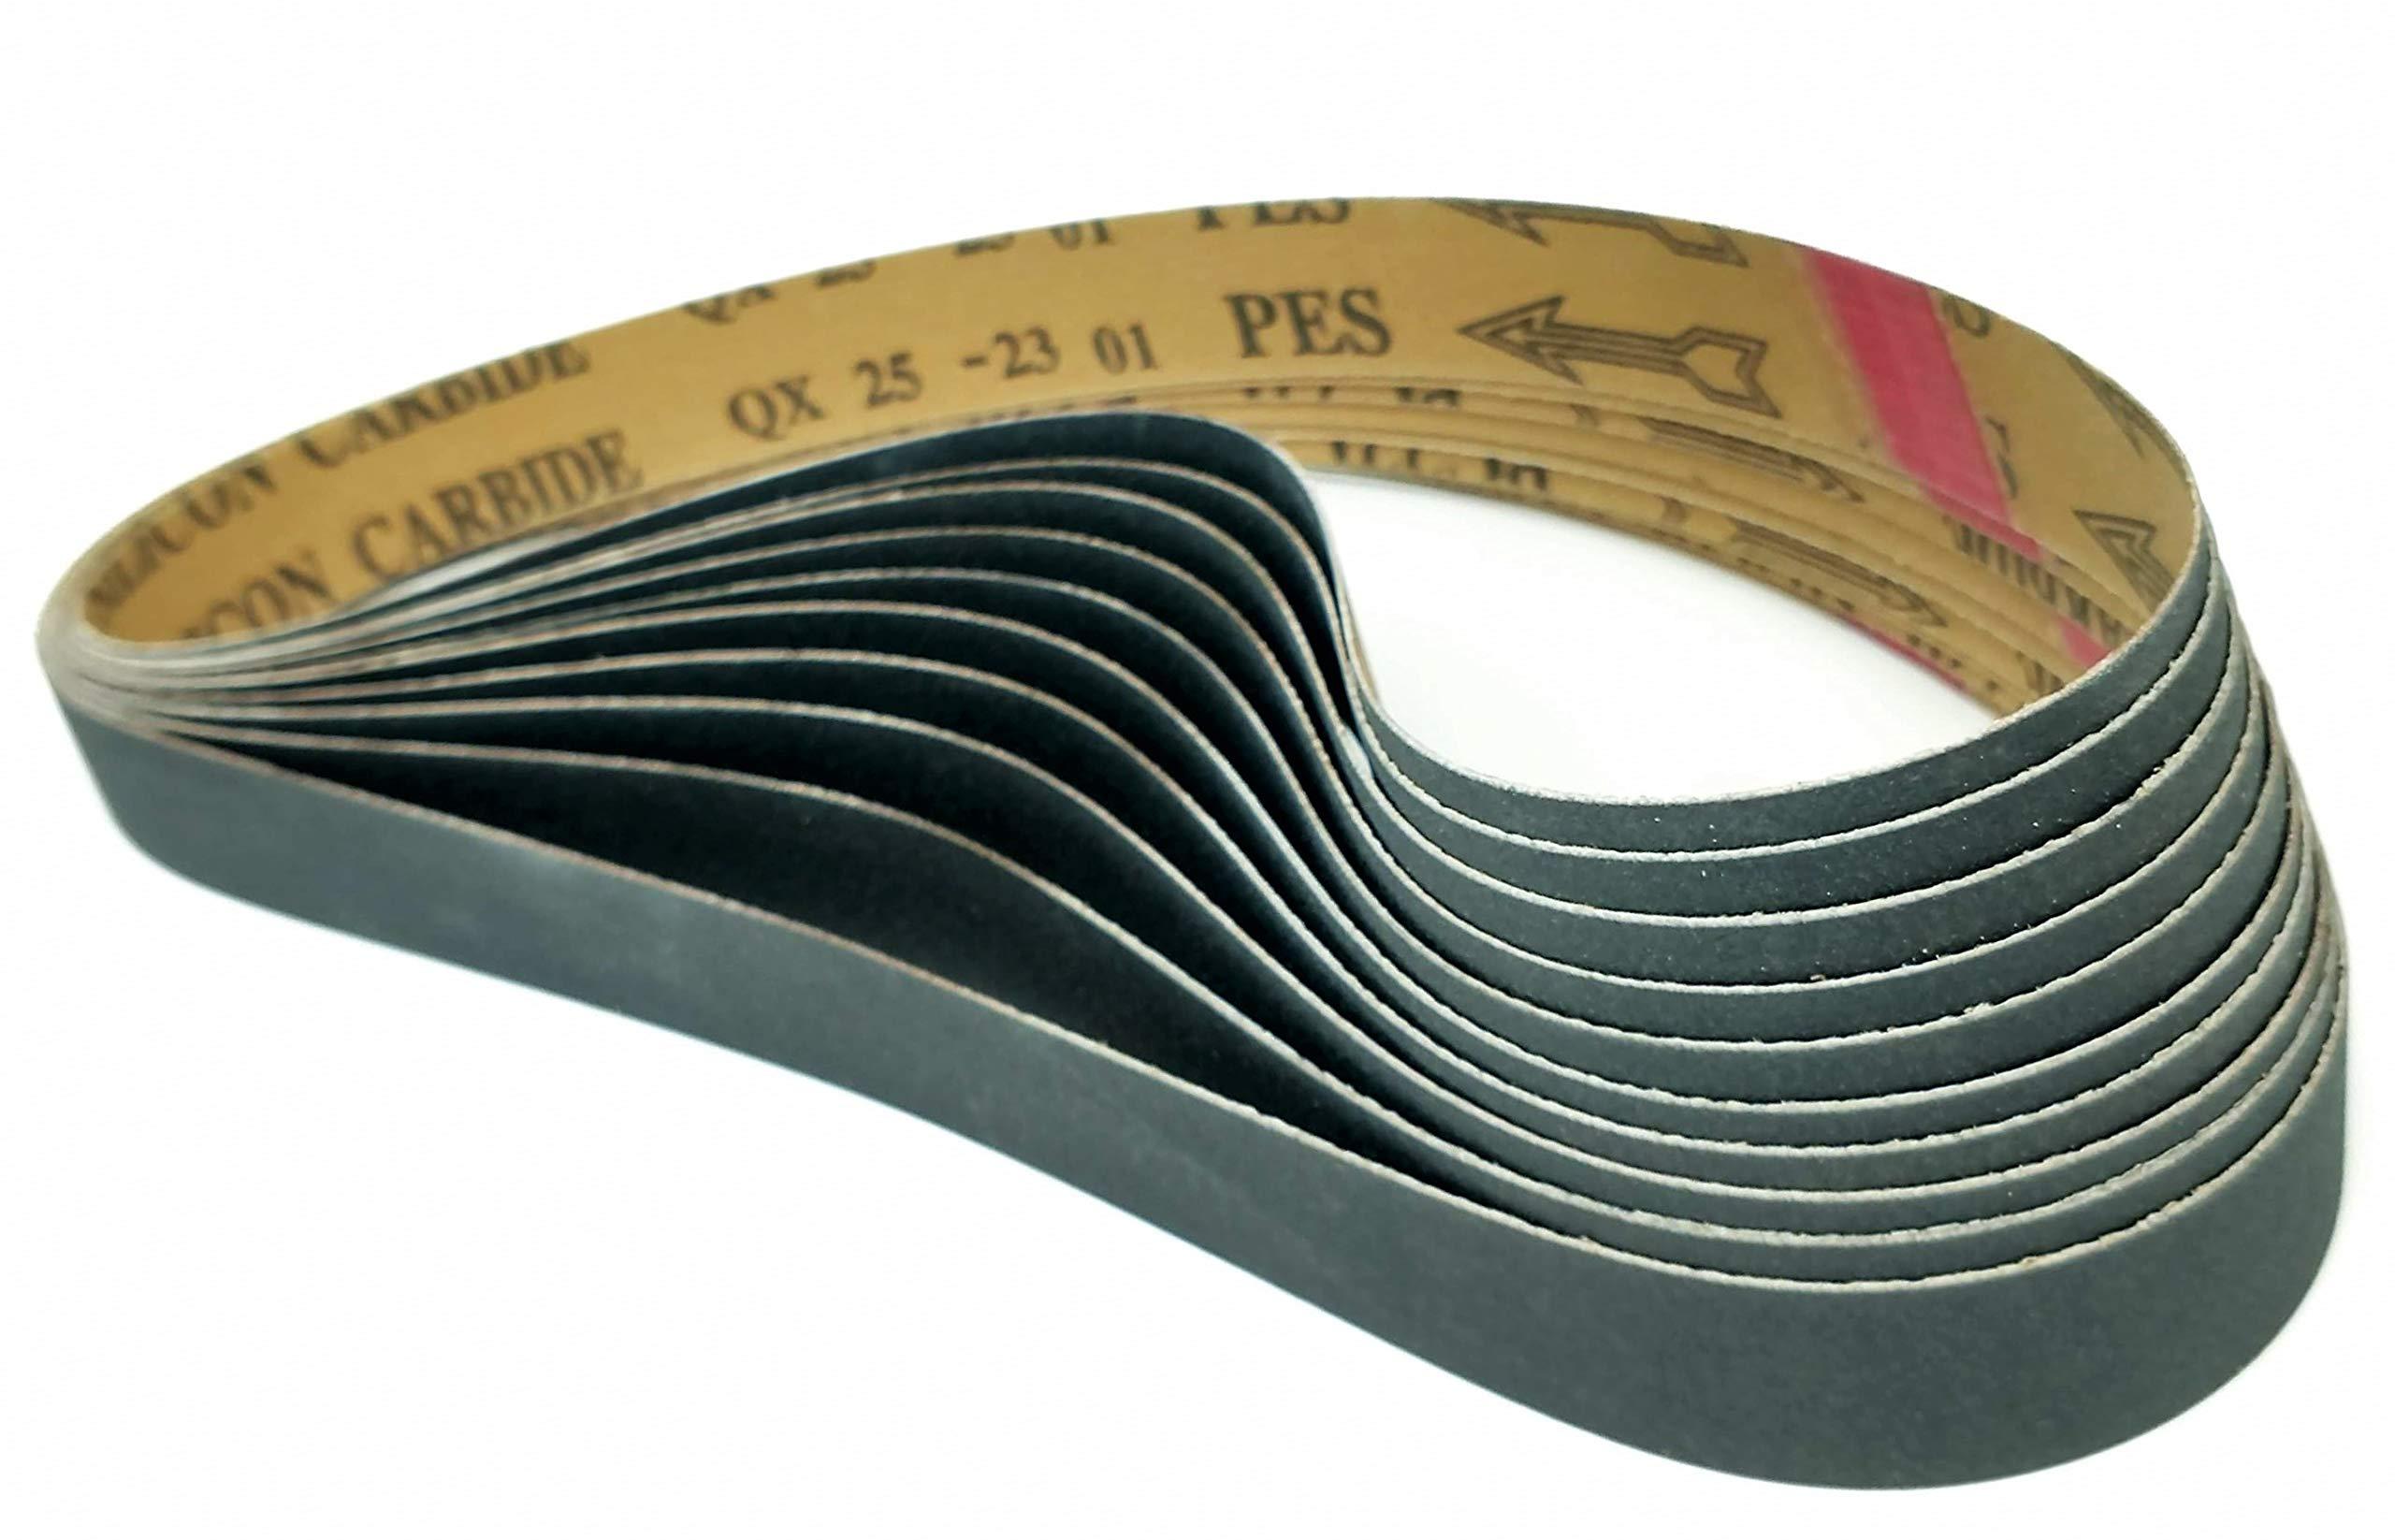 Sungold Abrasives 038797 600 Grit Cloth Sanding Belt Premium Industrial Silicon Carbide 1 x 30 1 x 30 10 Belts